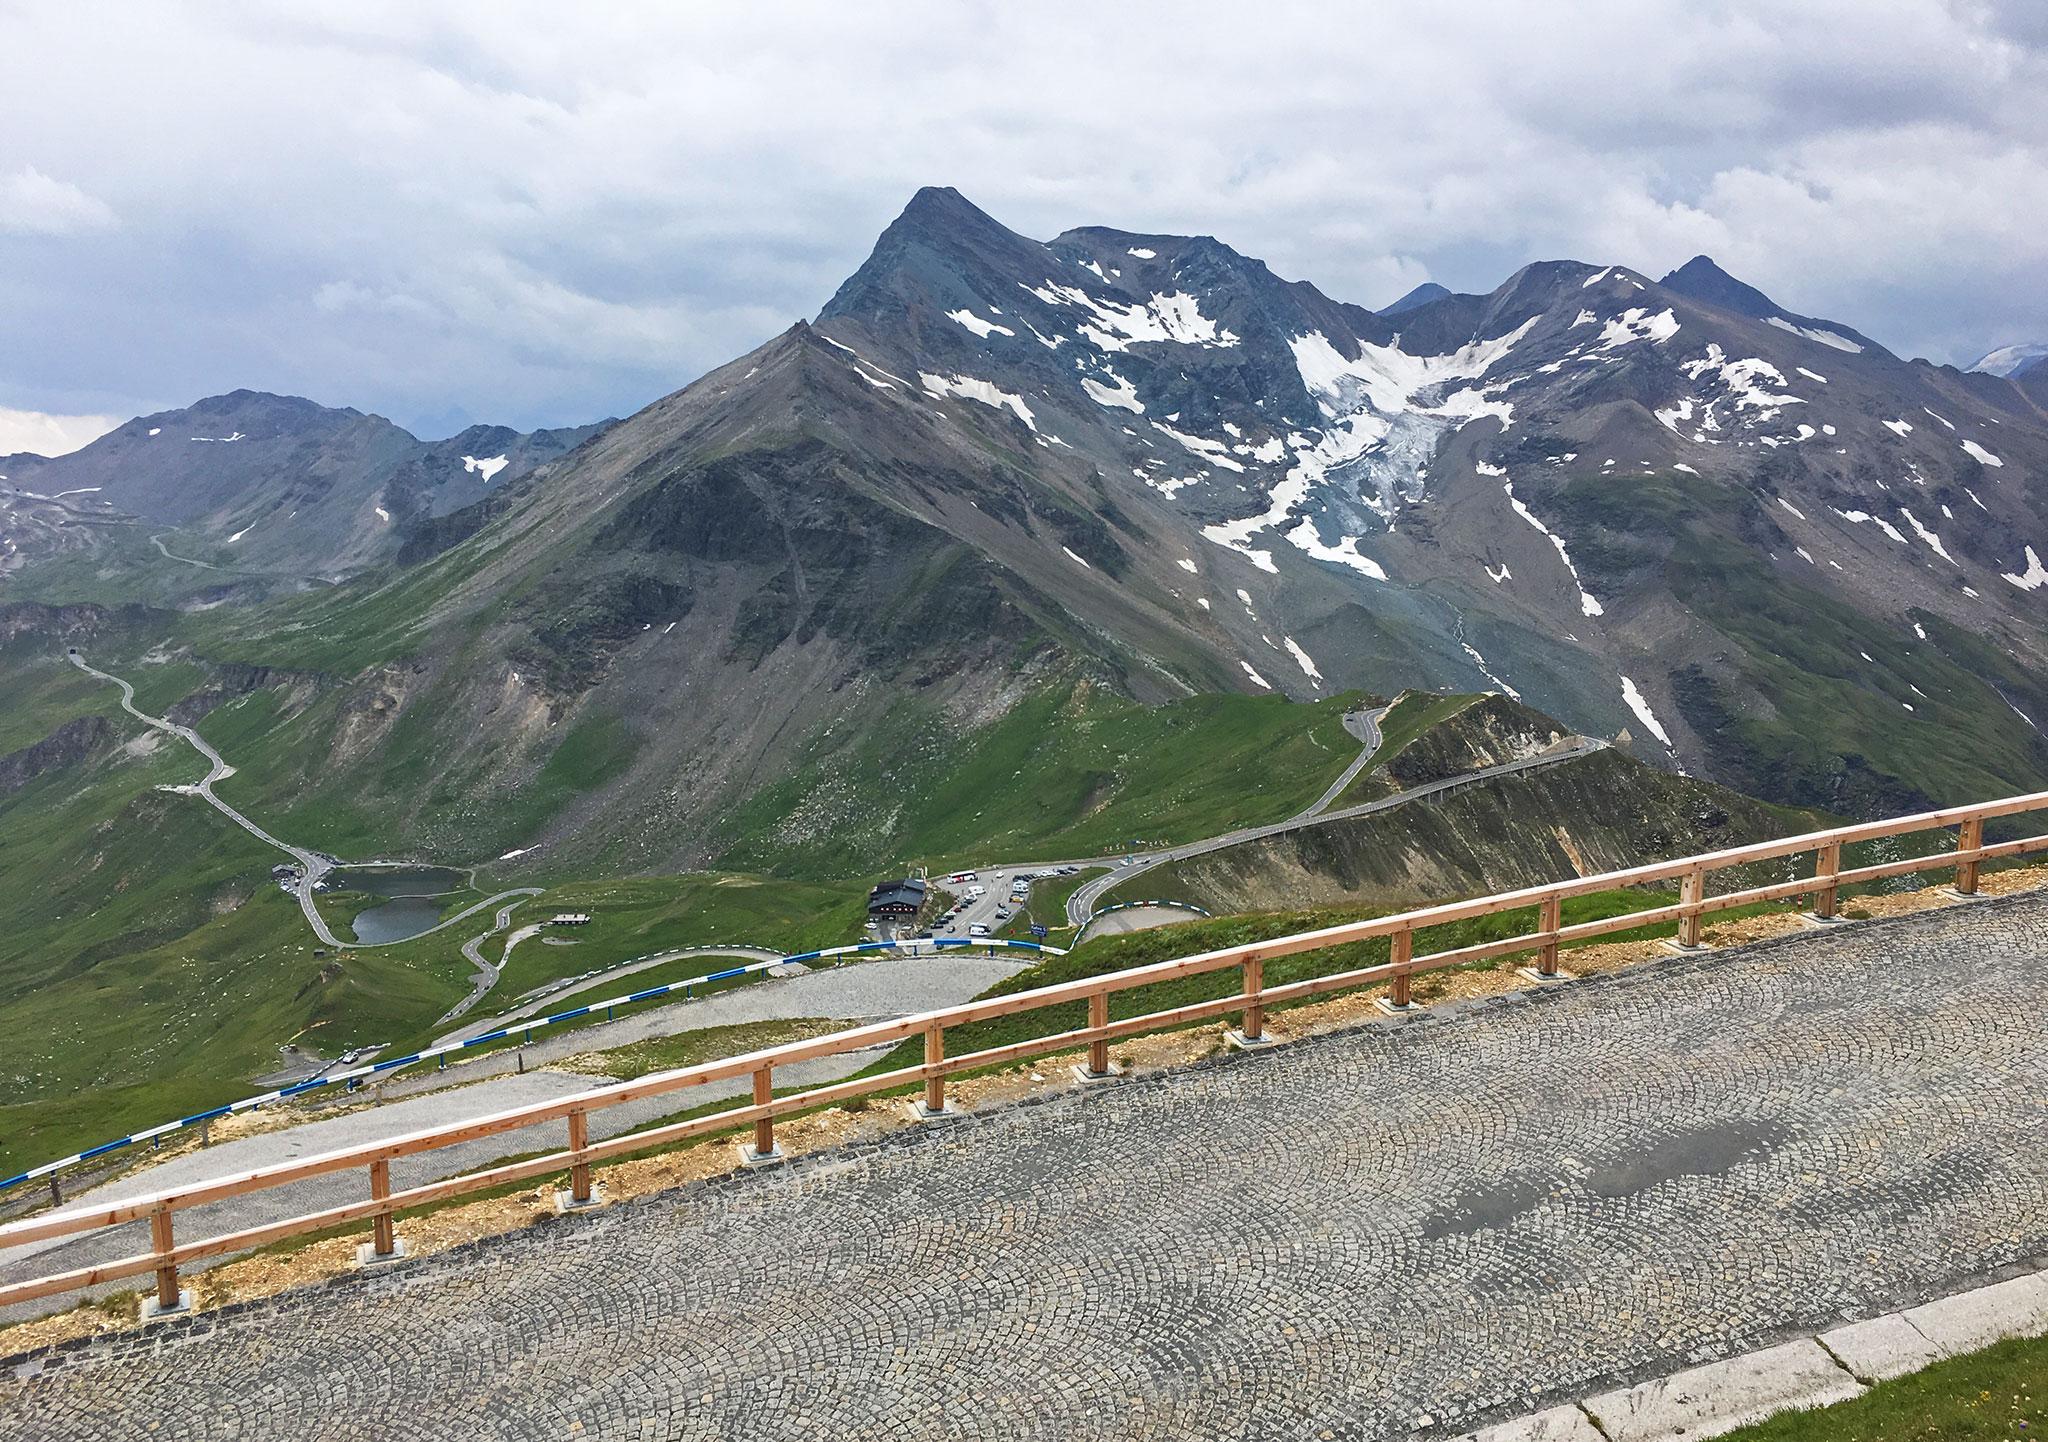 Cobblestone road to Edelweißhütte